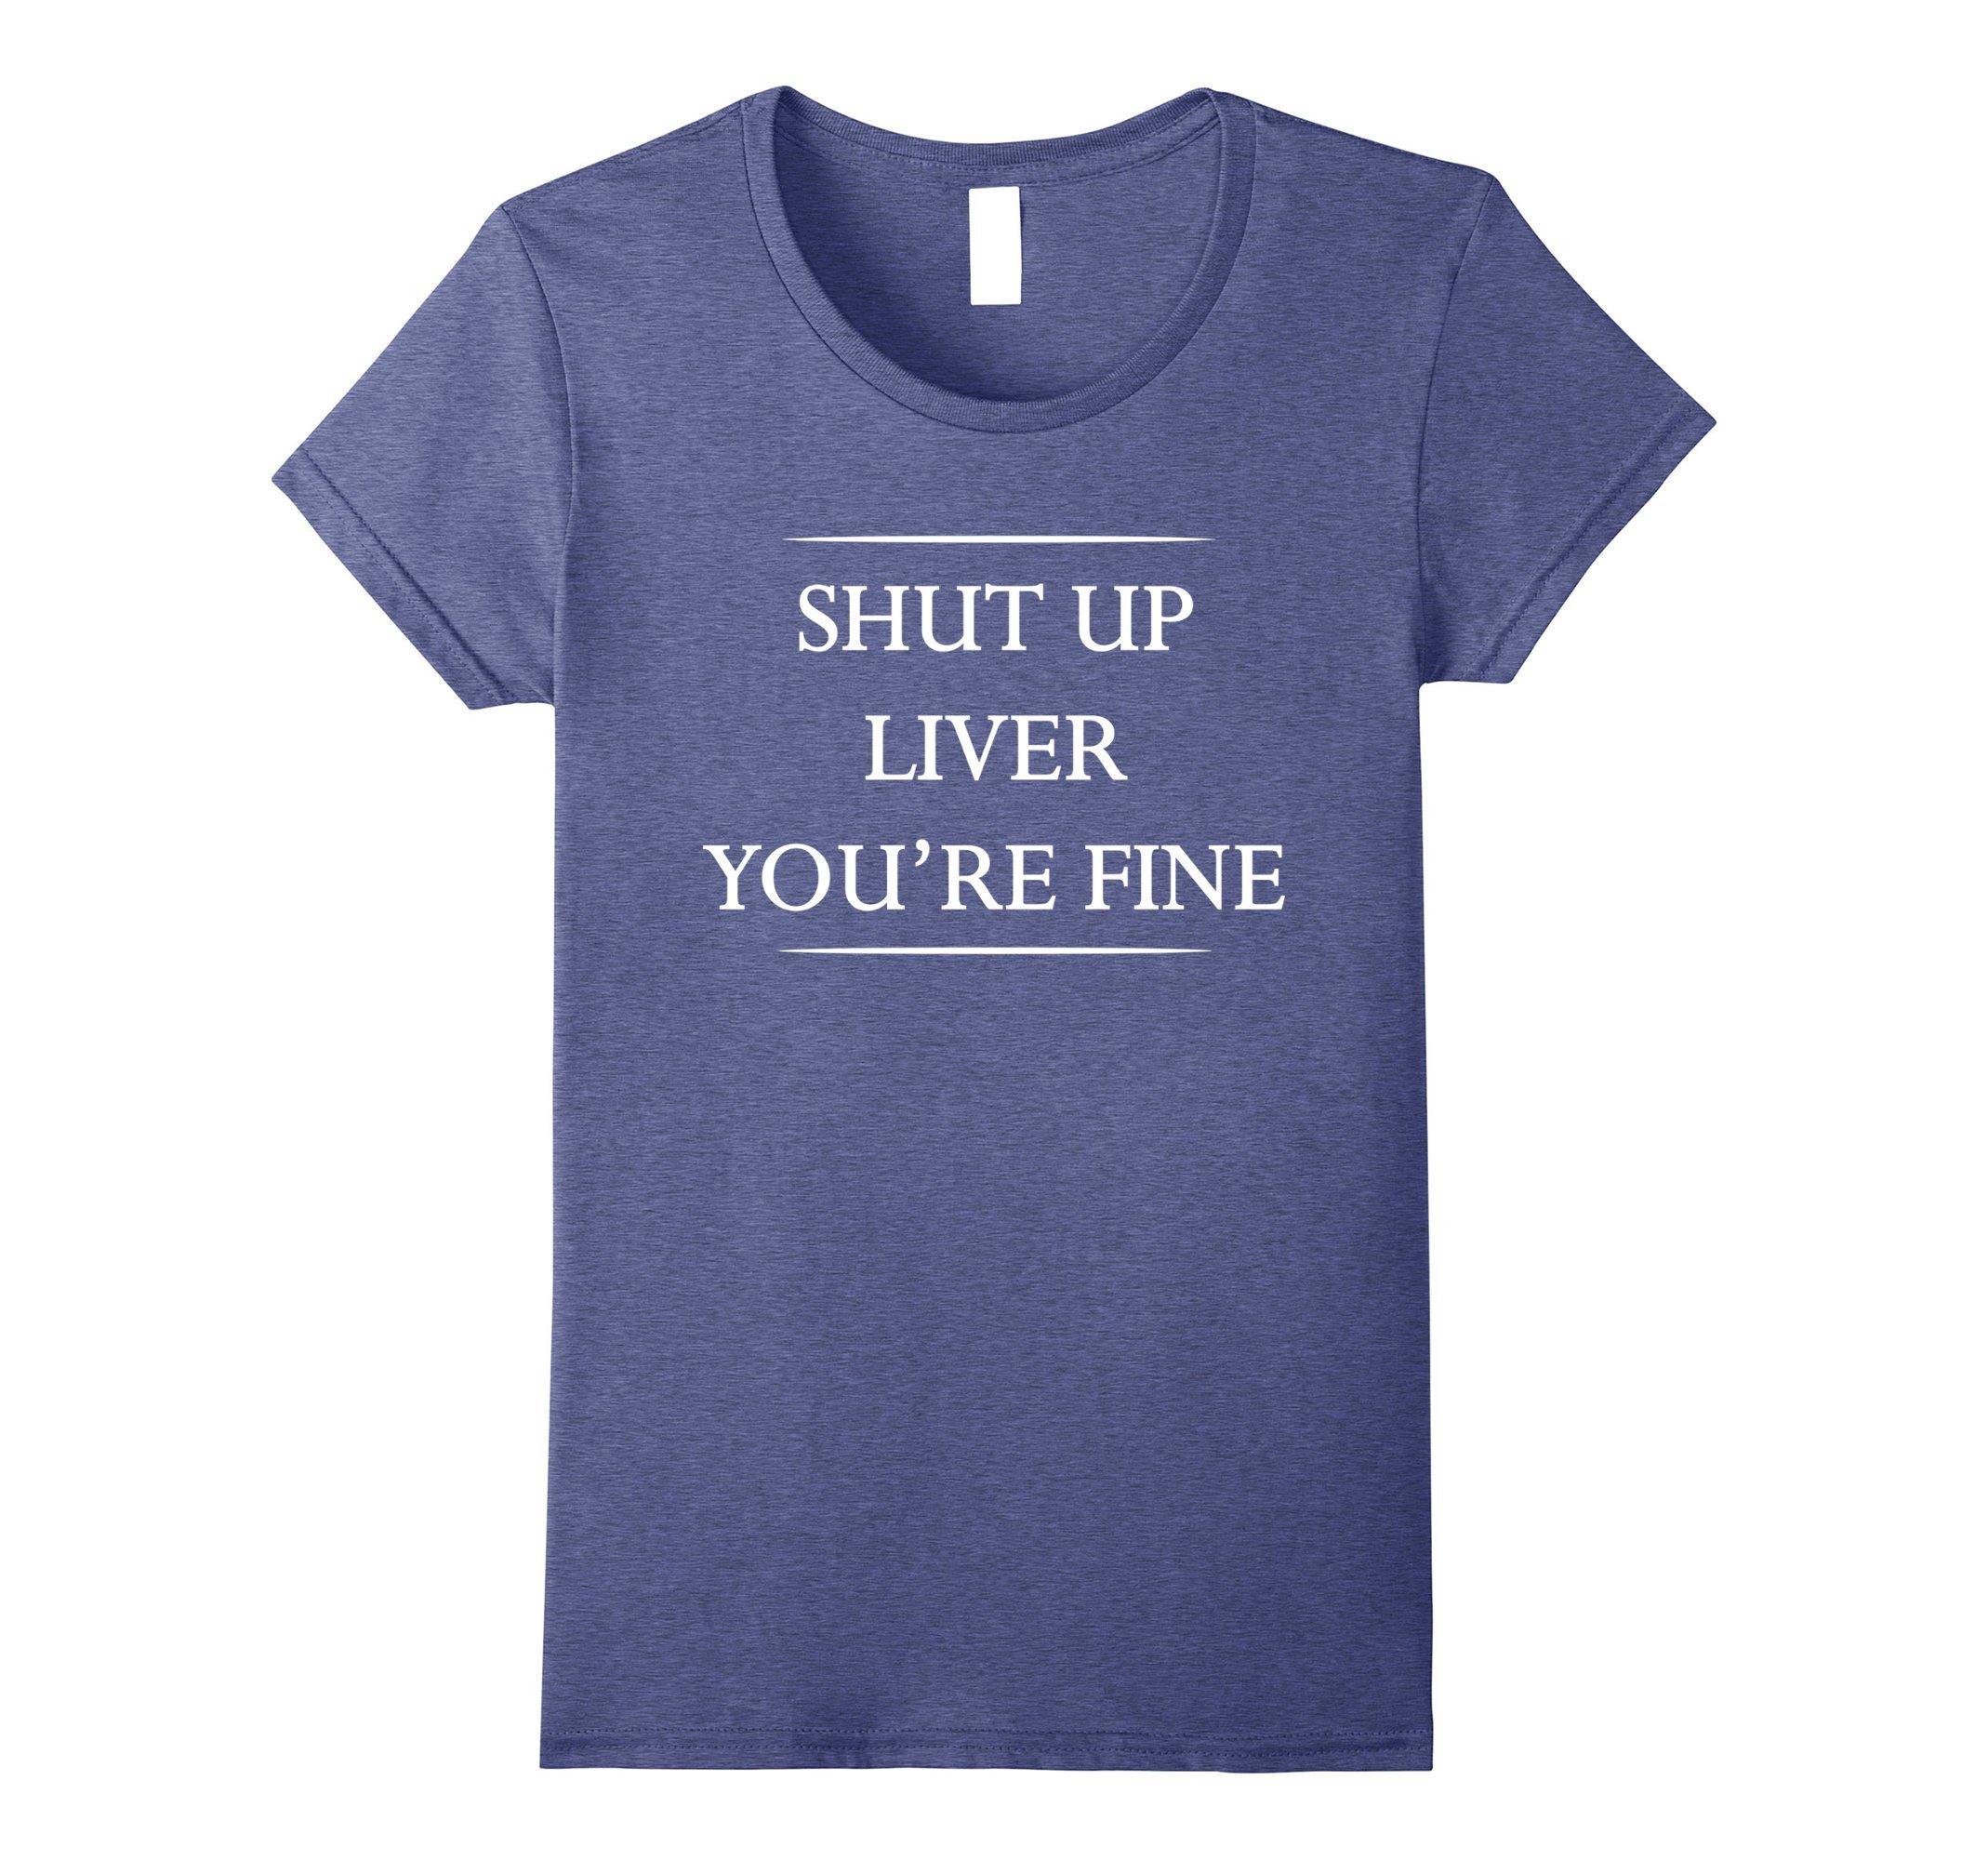 Womens Shut Up Liver You're Fine Tee Shirt - Fun Drinking T-Shirt Large Heather Blue